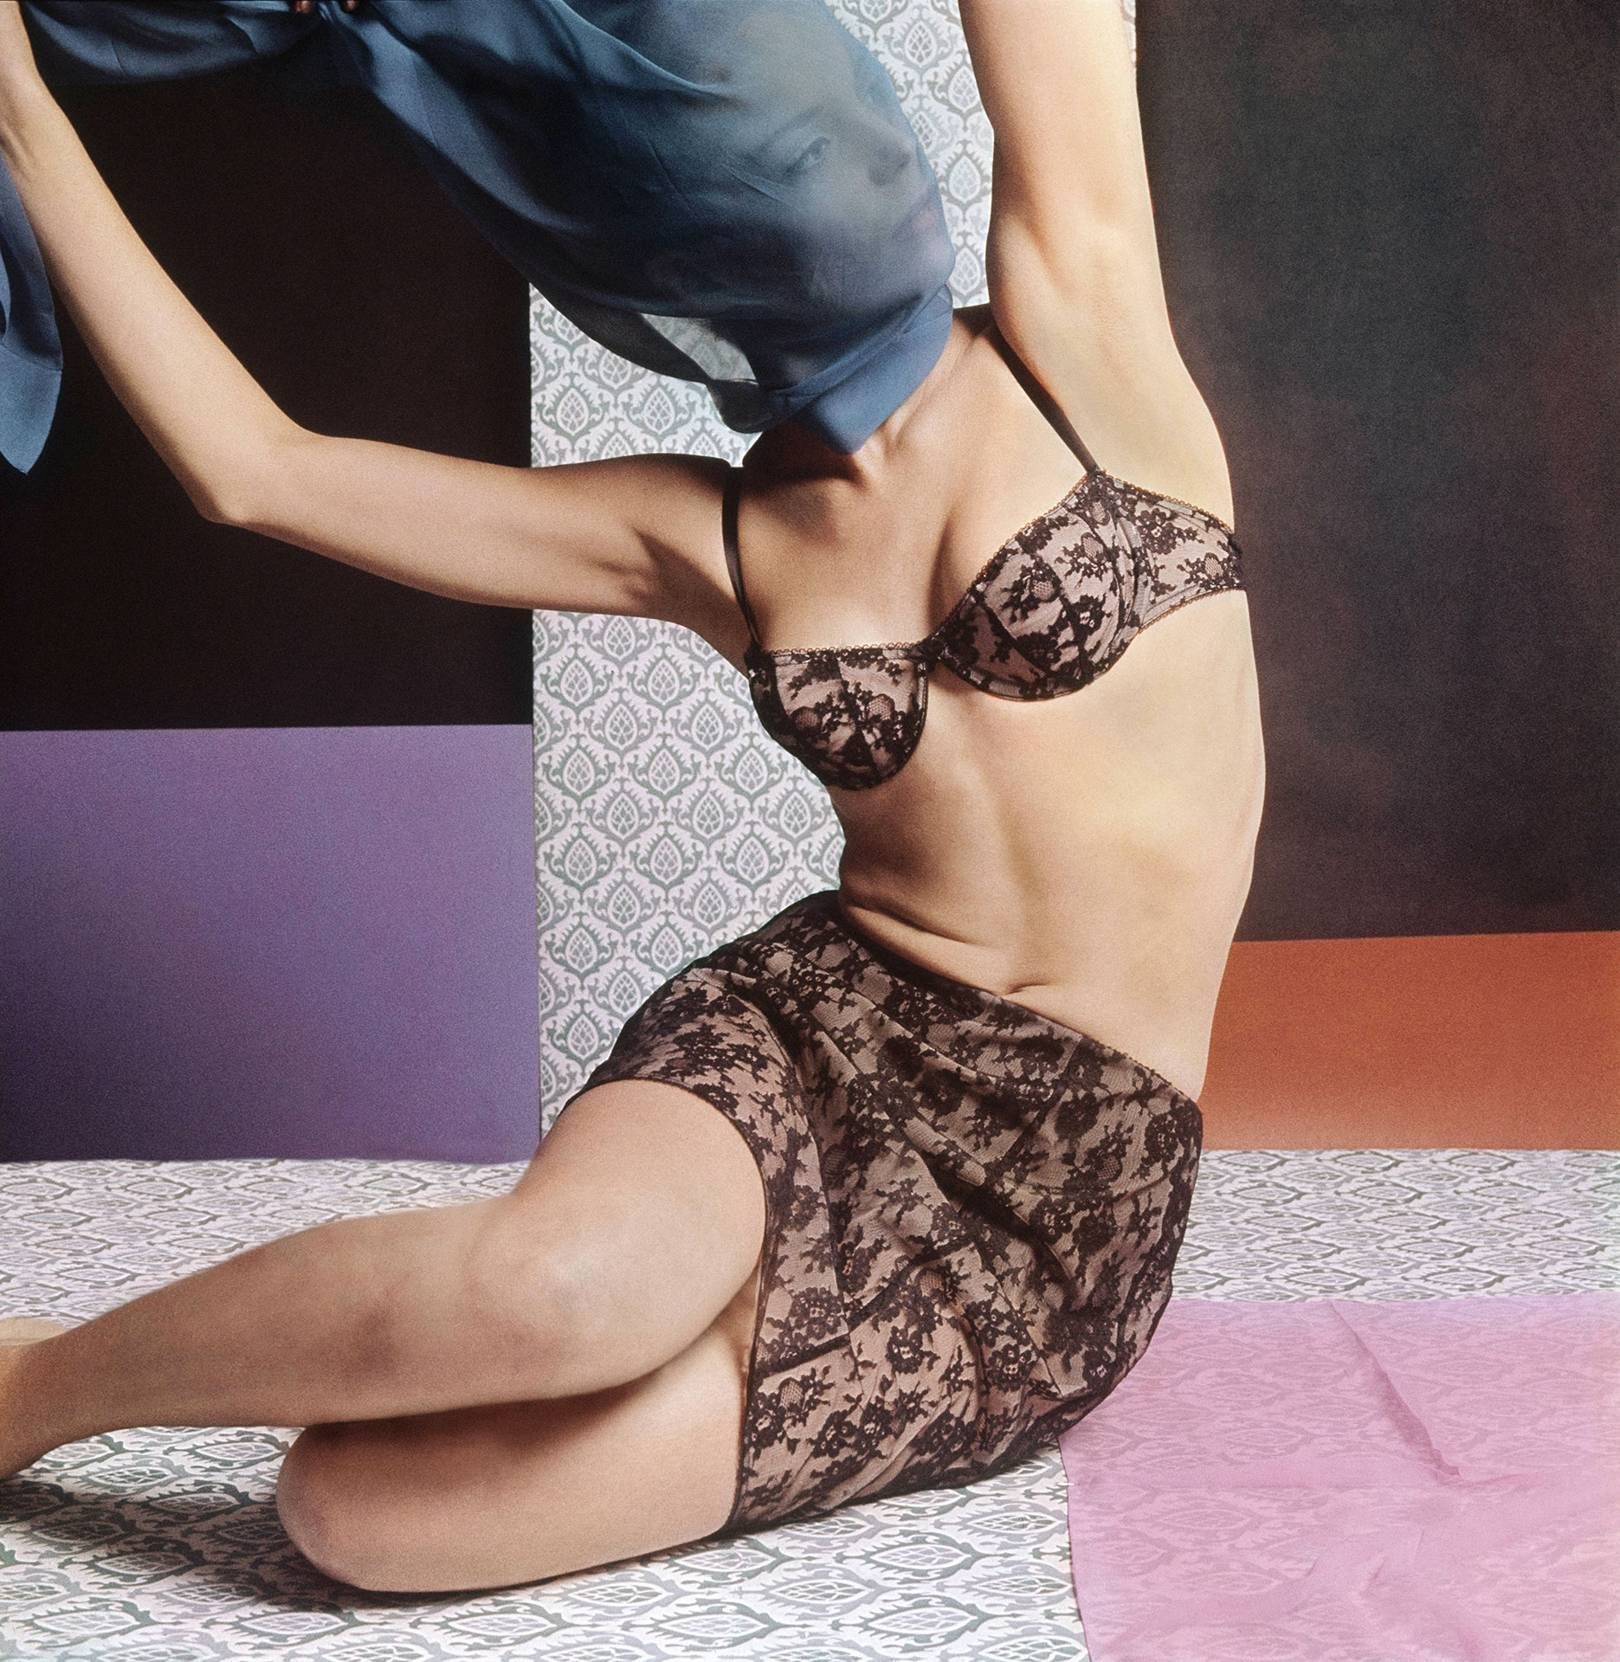 c7a0fb9ac4 Lingerie Drawer Spring Clean - Essential Underwear